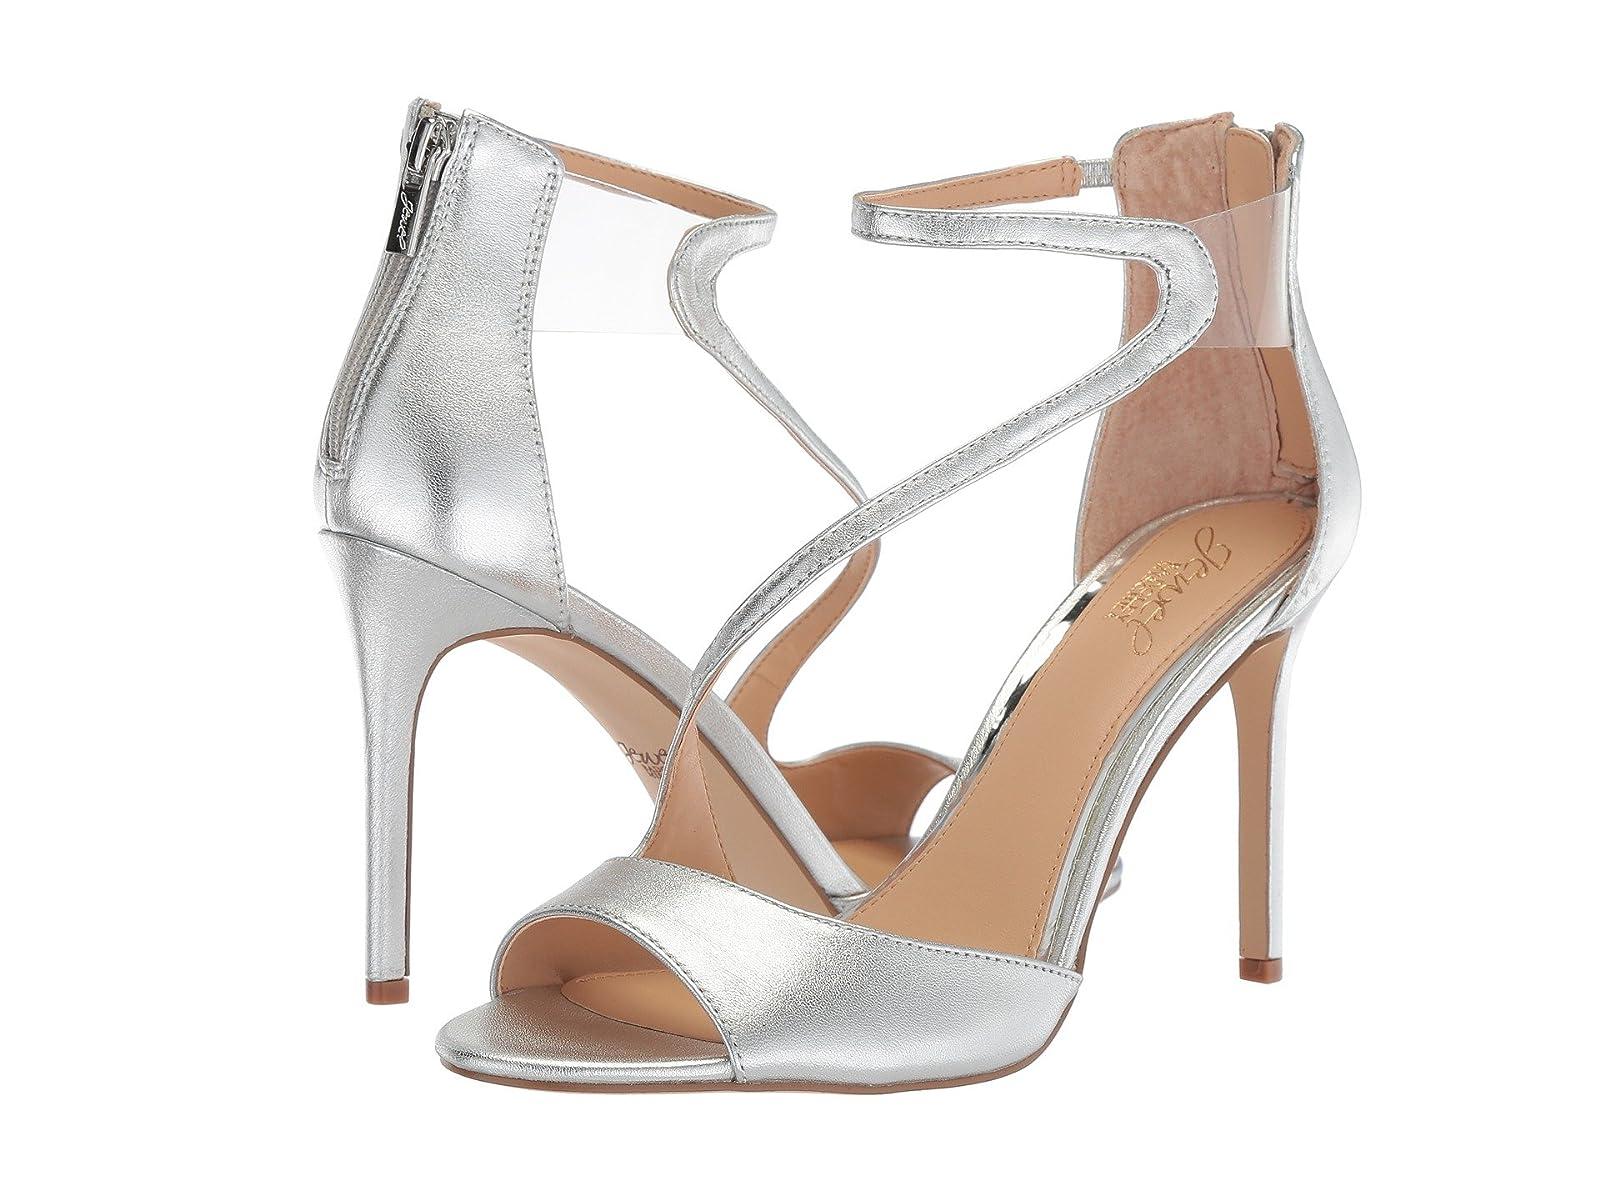 Jewel Badgley Mischka TaylerCheap and distinctive eye-catching shoes